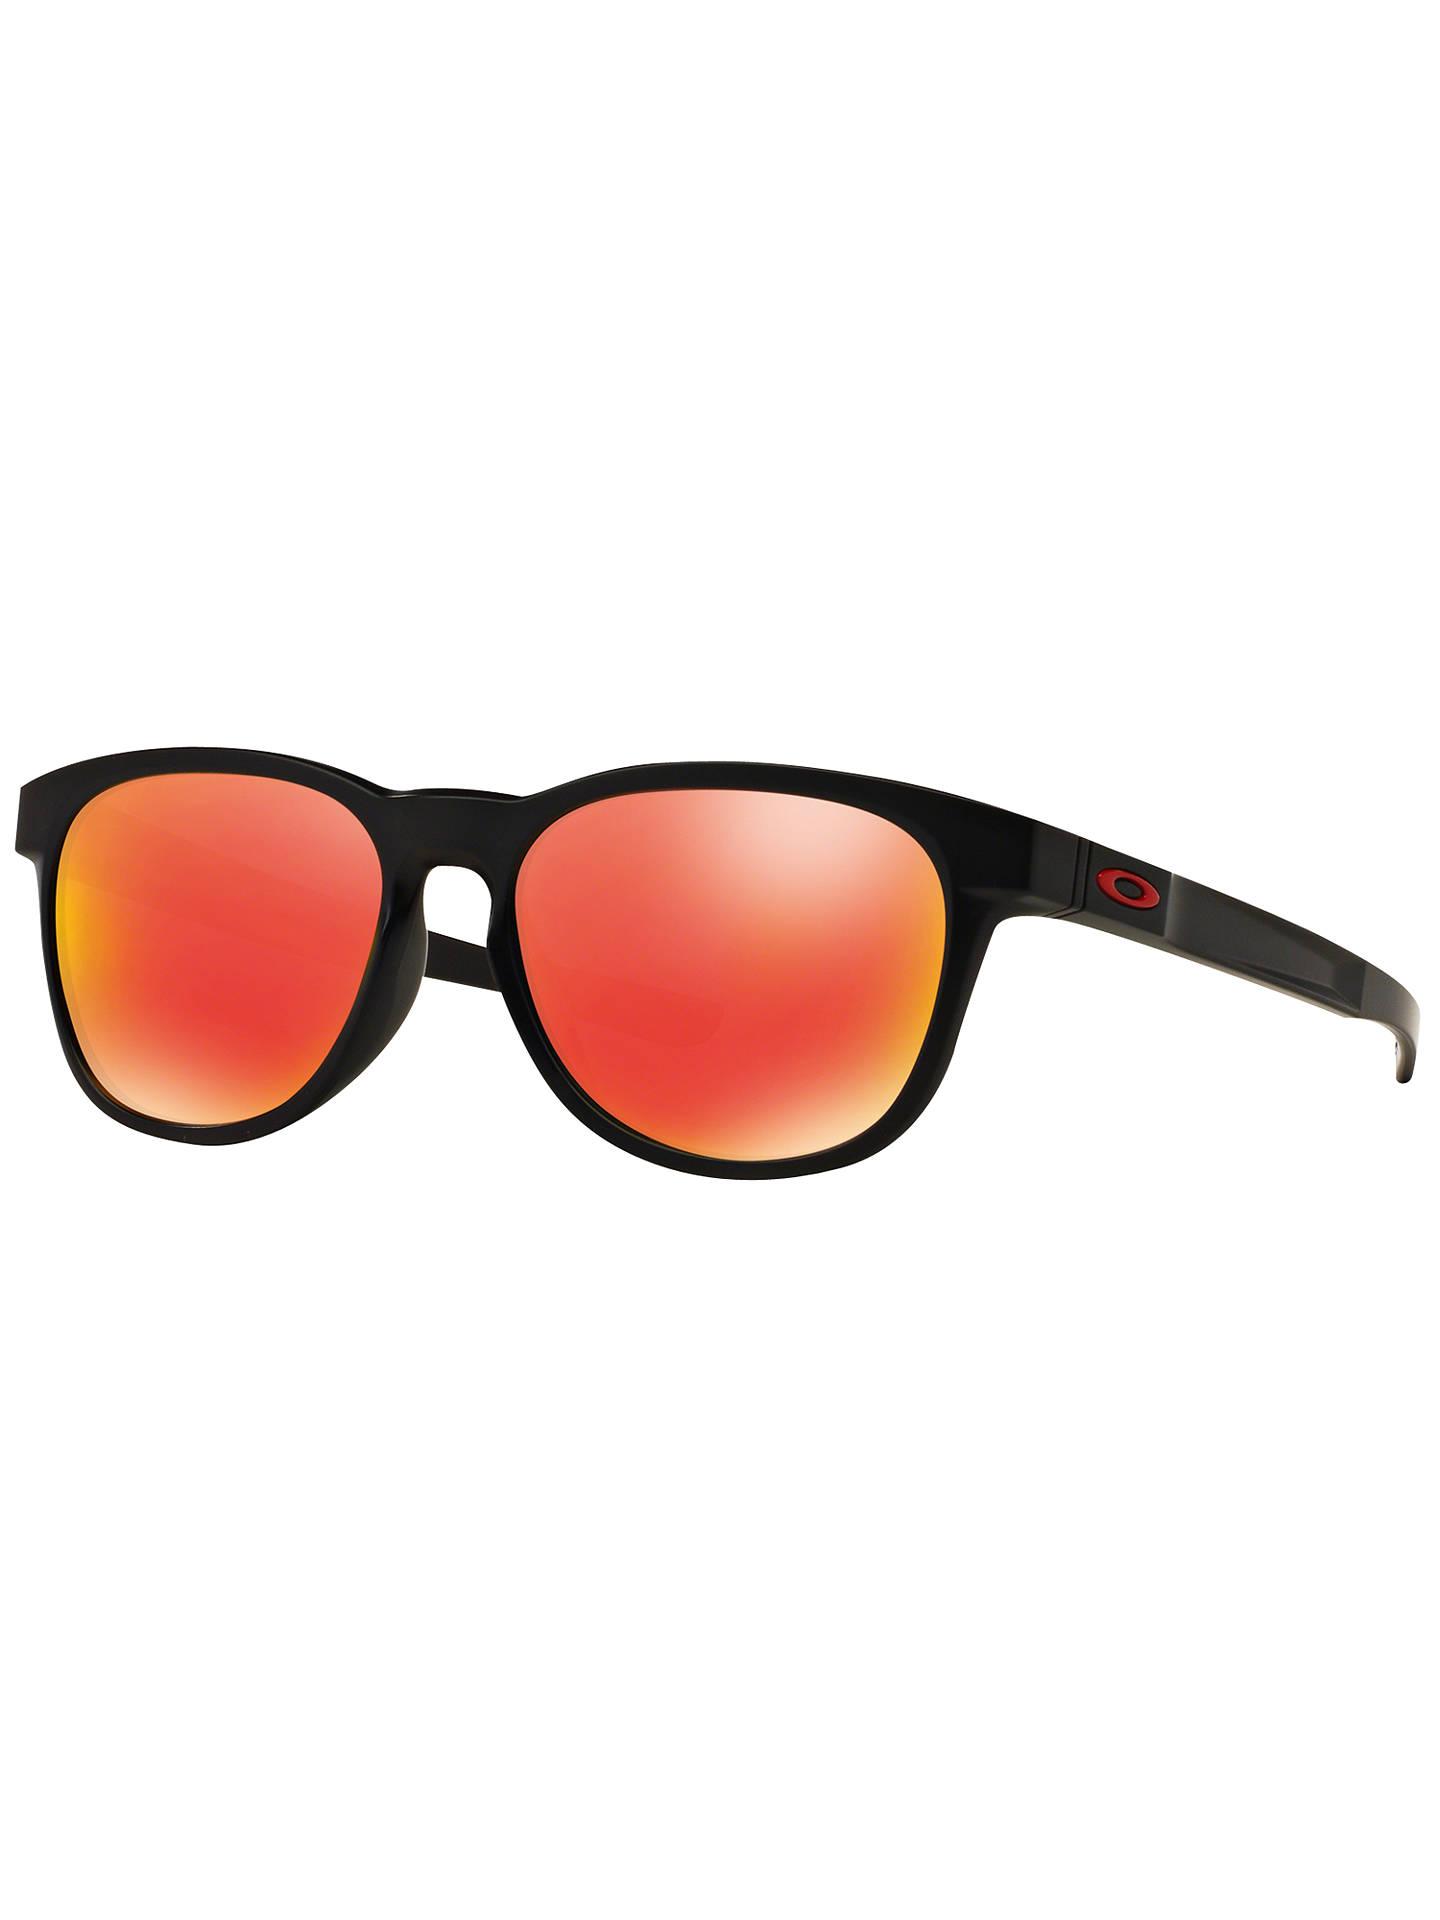 a3f0cd92c695e Oakley OO9315 Stringer D-Frame Sunglasses at John Lewis   Partners